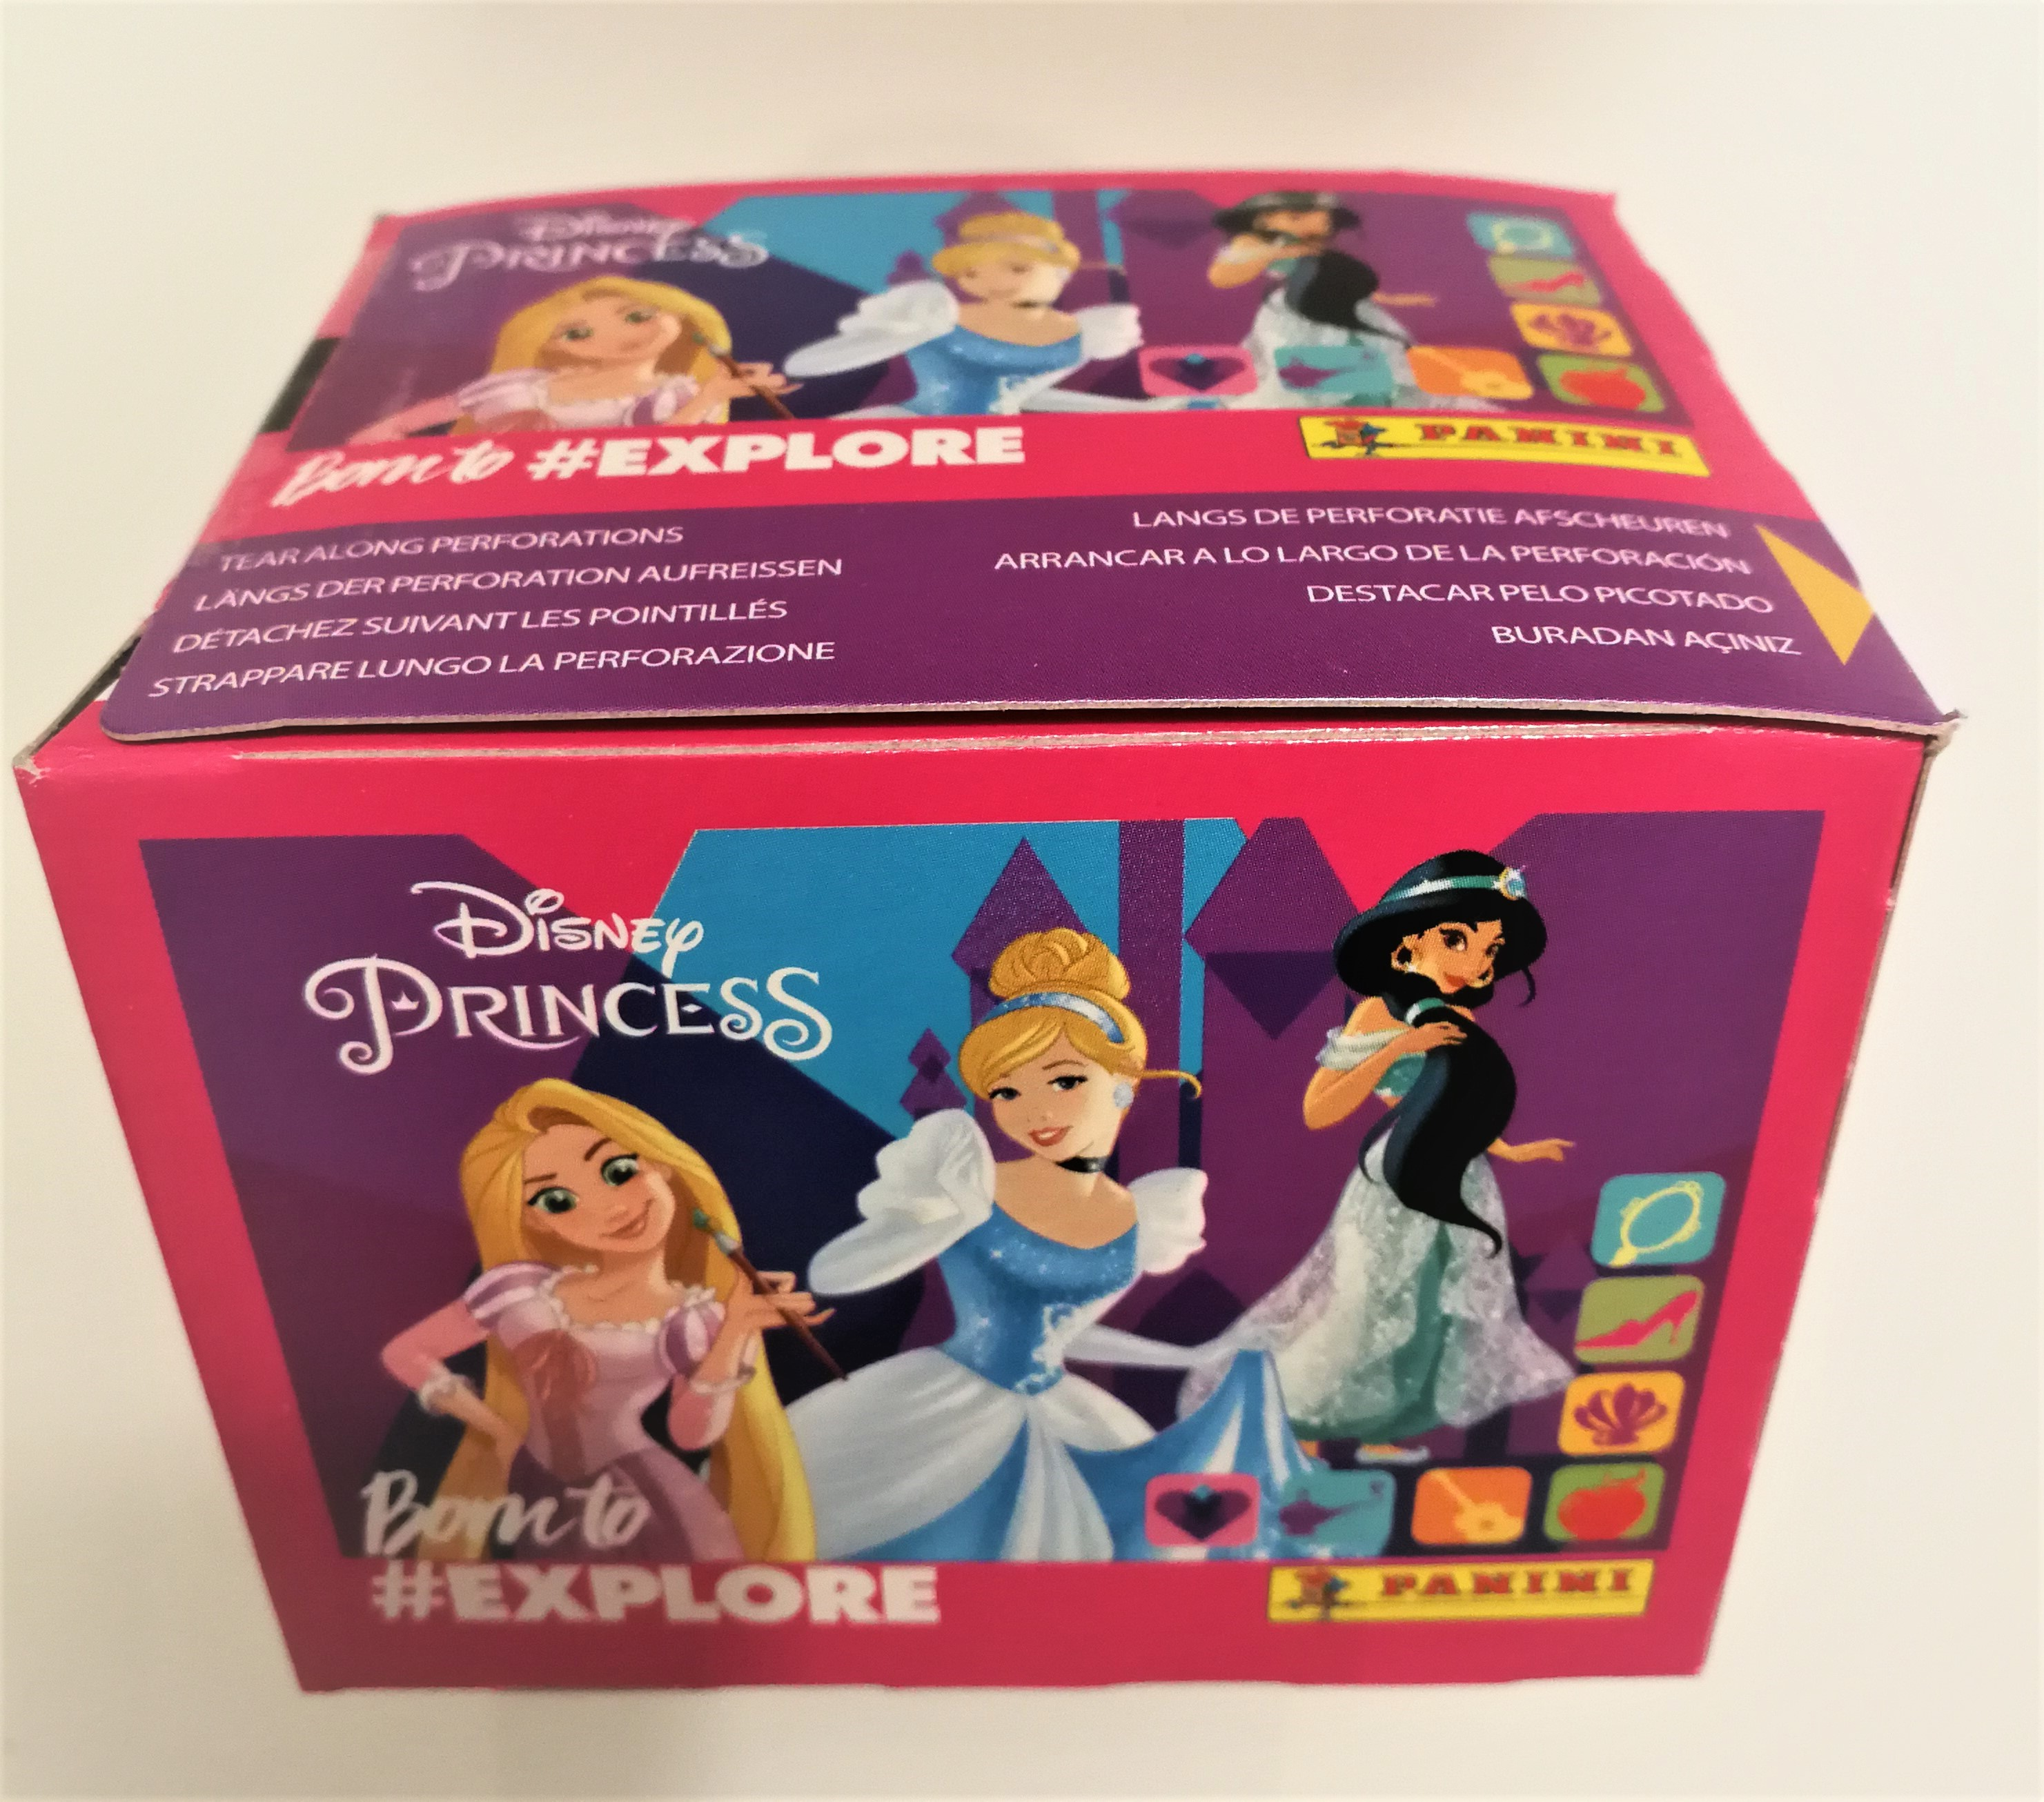 Box 50 Bustine figurine Panini Principesse Born  To  #Explore Disney